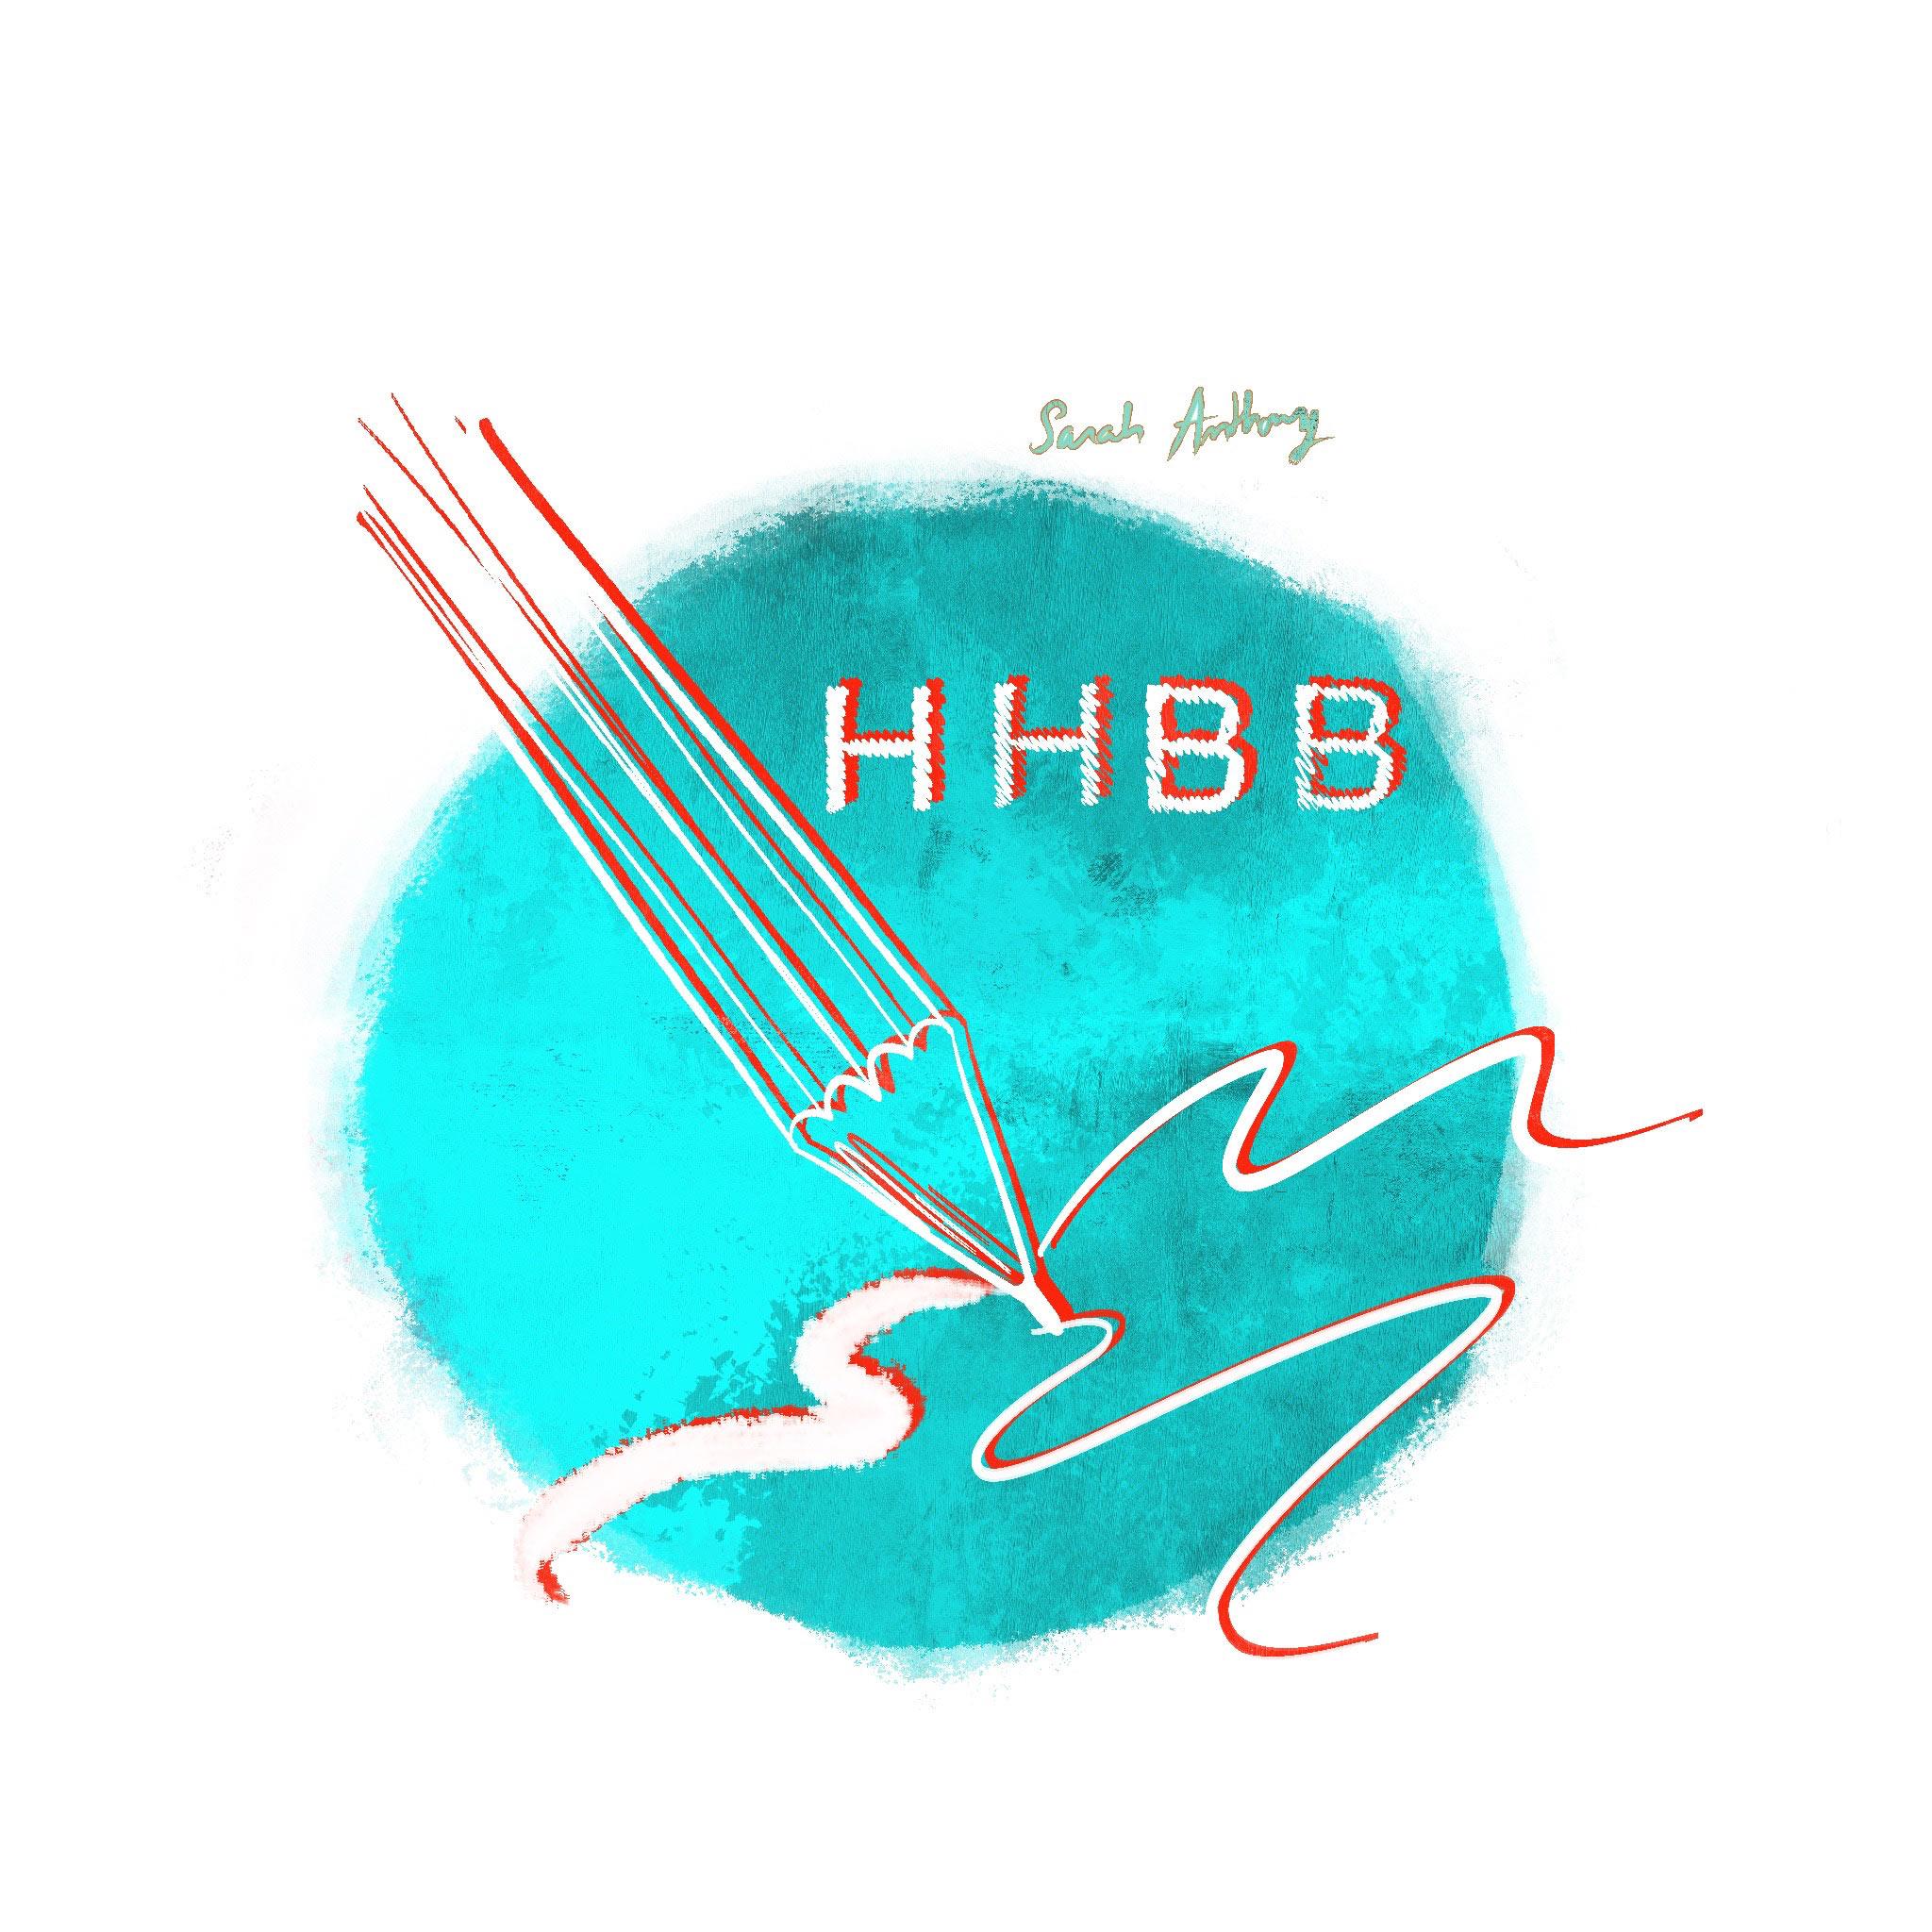 h-hb-b-sarah-anthony-reduit